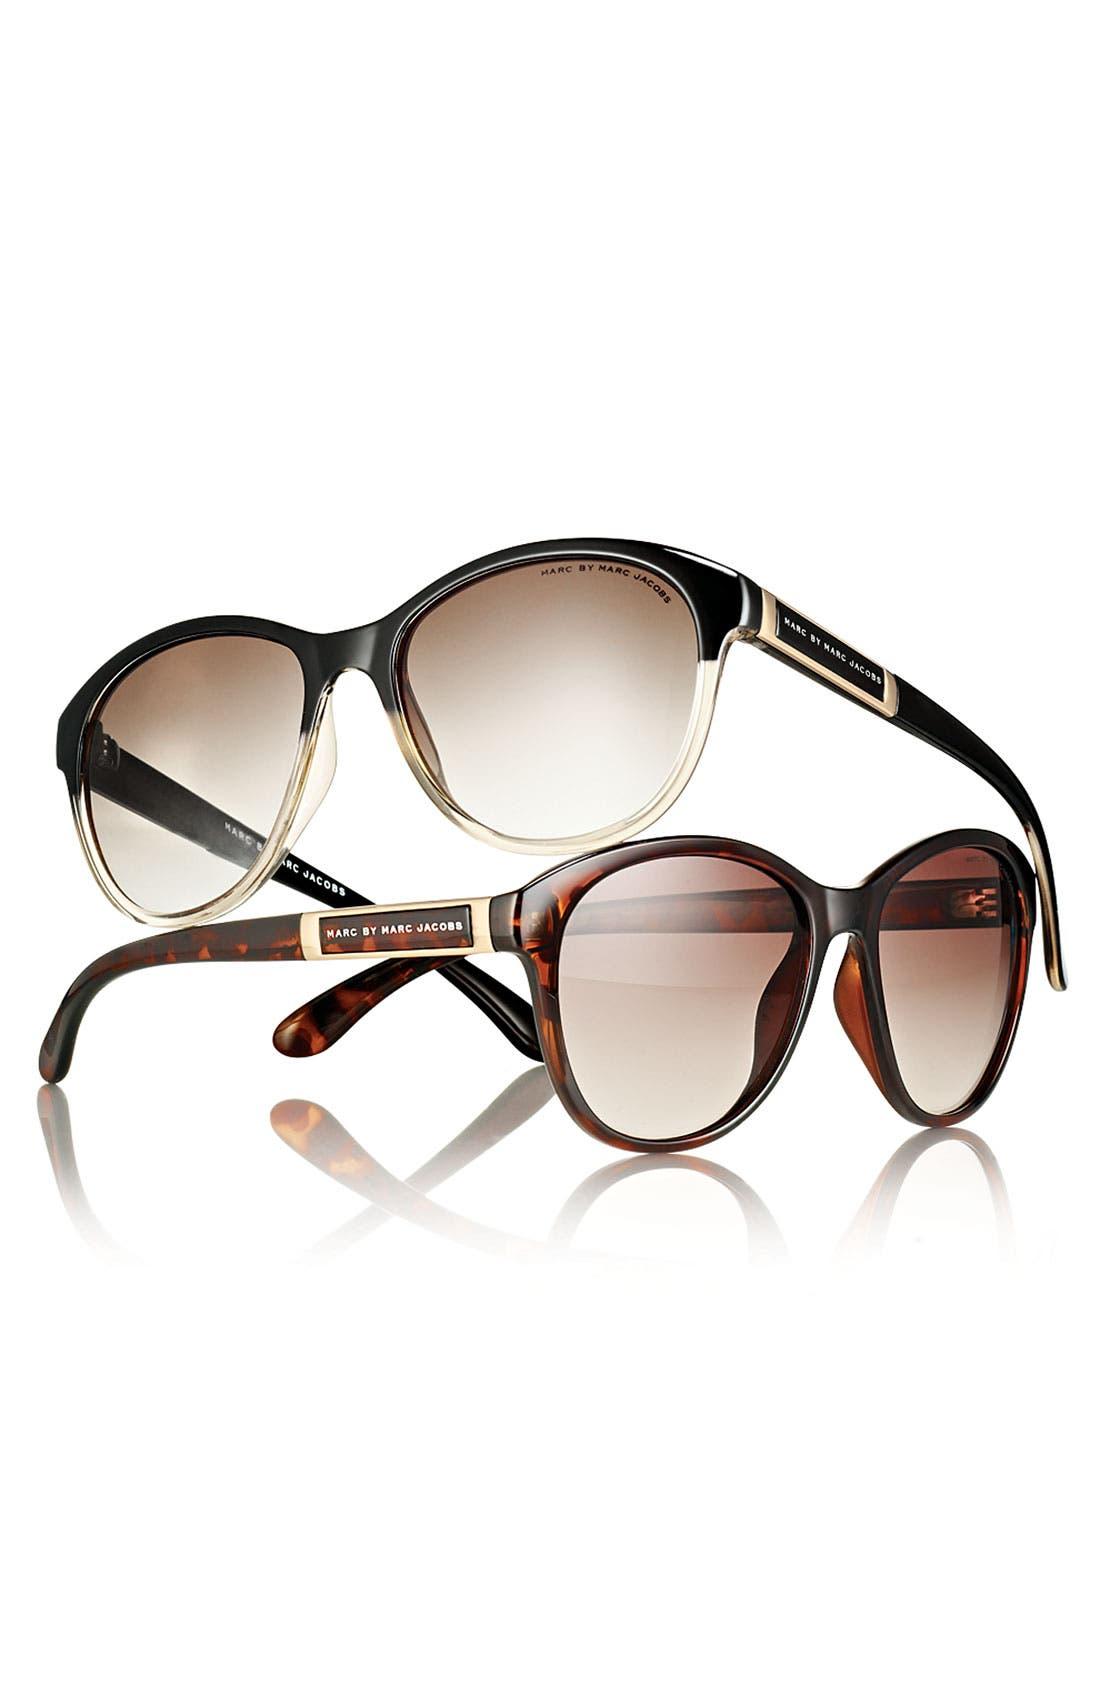 Retro Plastic Sunglasses,                             Main thumbnail 1, color,                             201